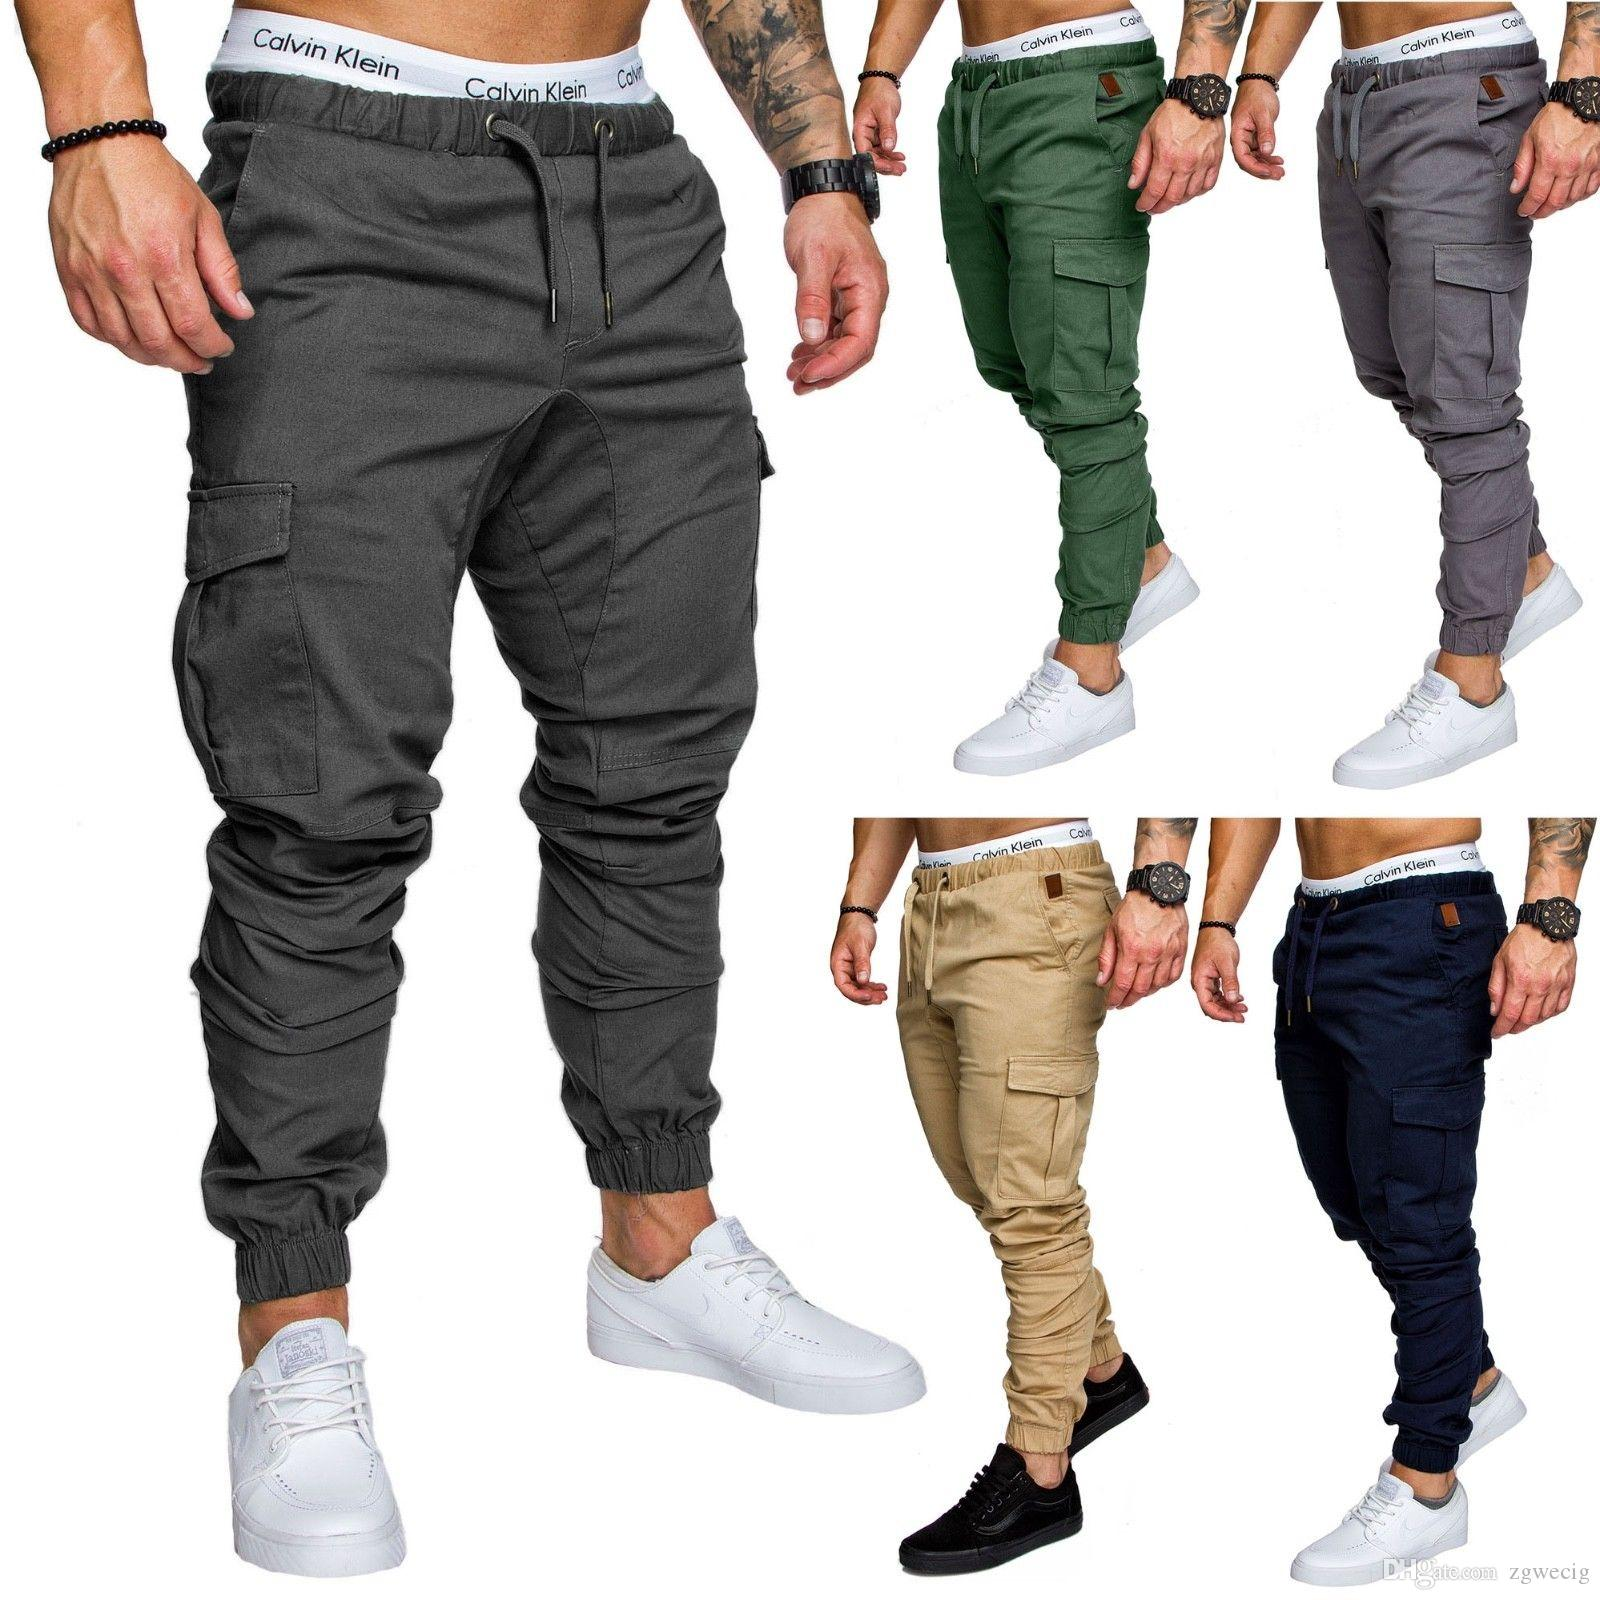 Joggers para hombre HIPHOP baja entrepierna para pantalones vaqueros hip hop sarouel dance holgados pantalones pantalon Homme harem pantalones para hombres